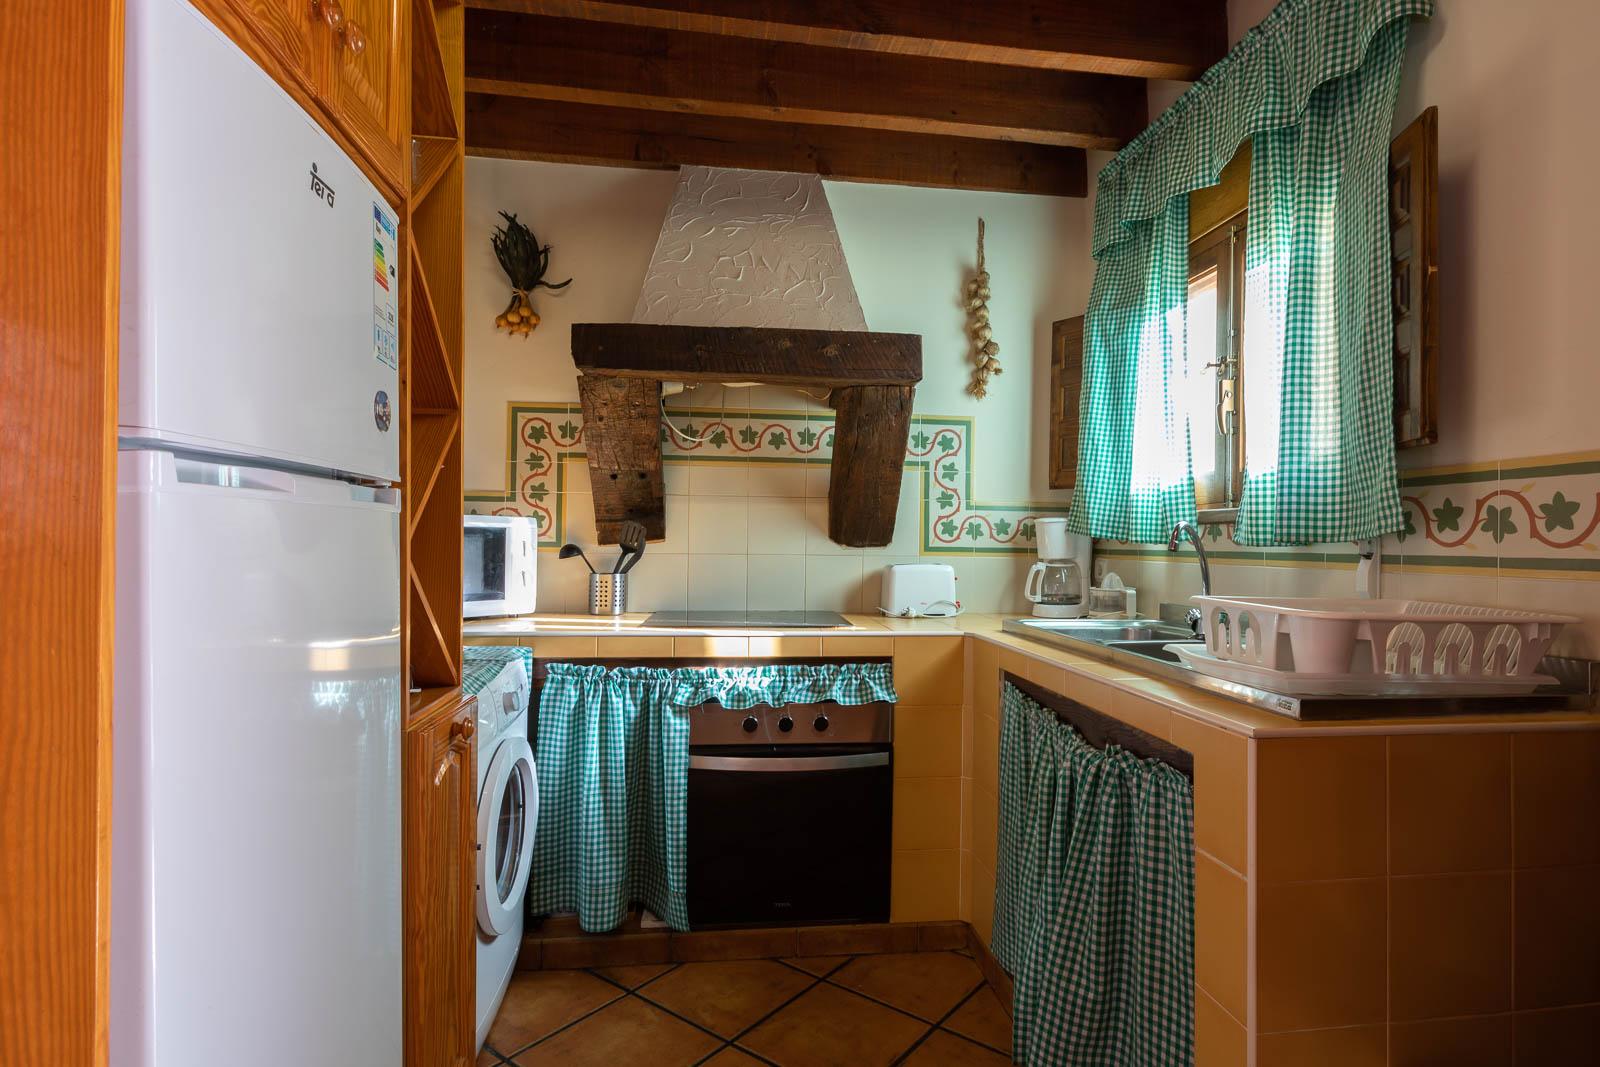 Casa Ernesto Alojamiento Rural Zamora Pajares de la Lampreana Villafáfila